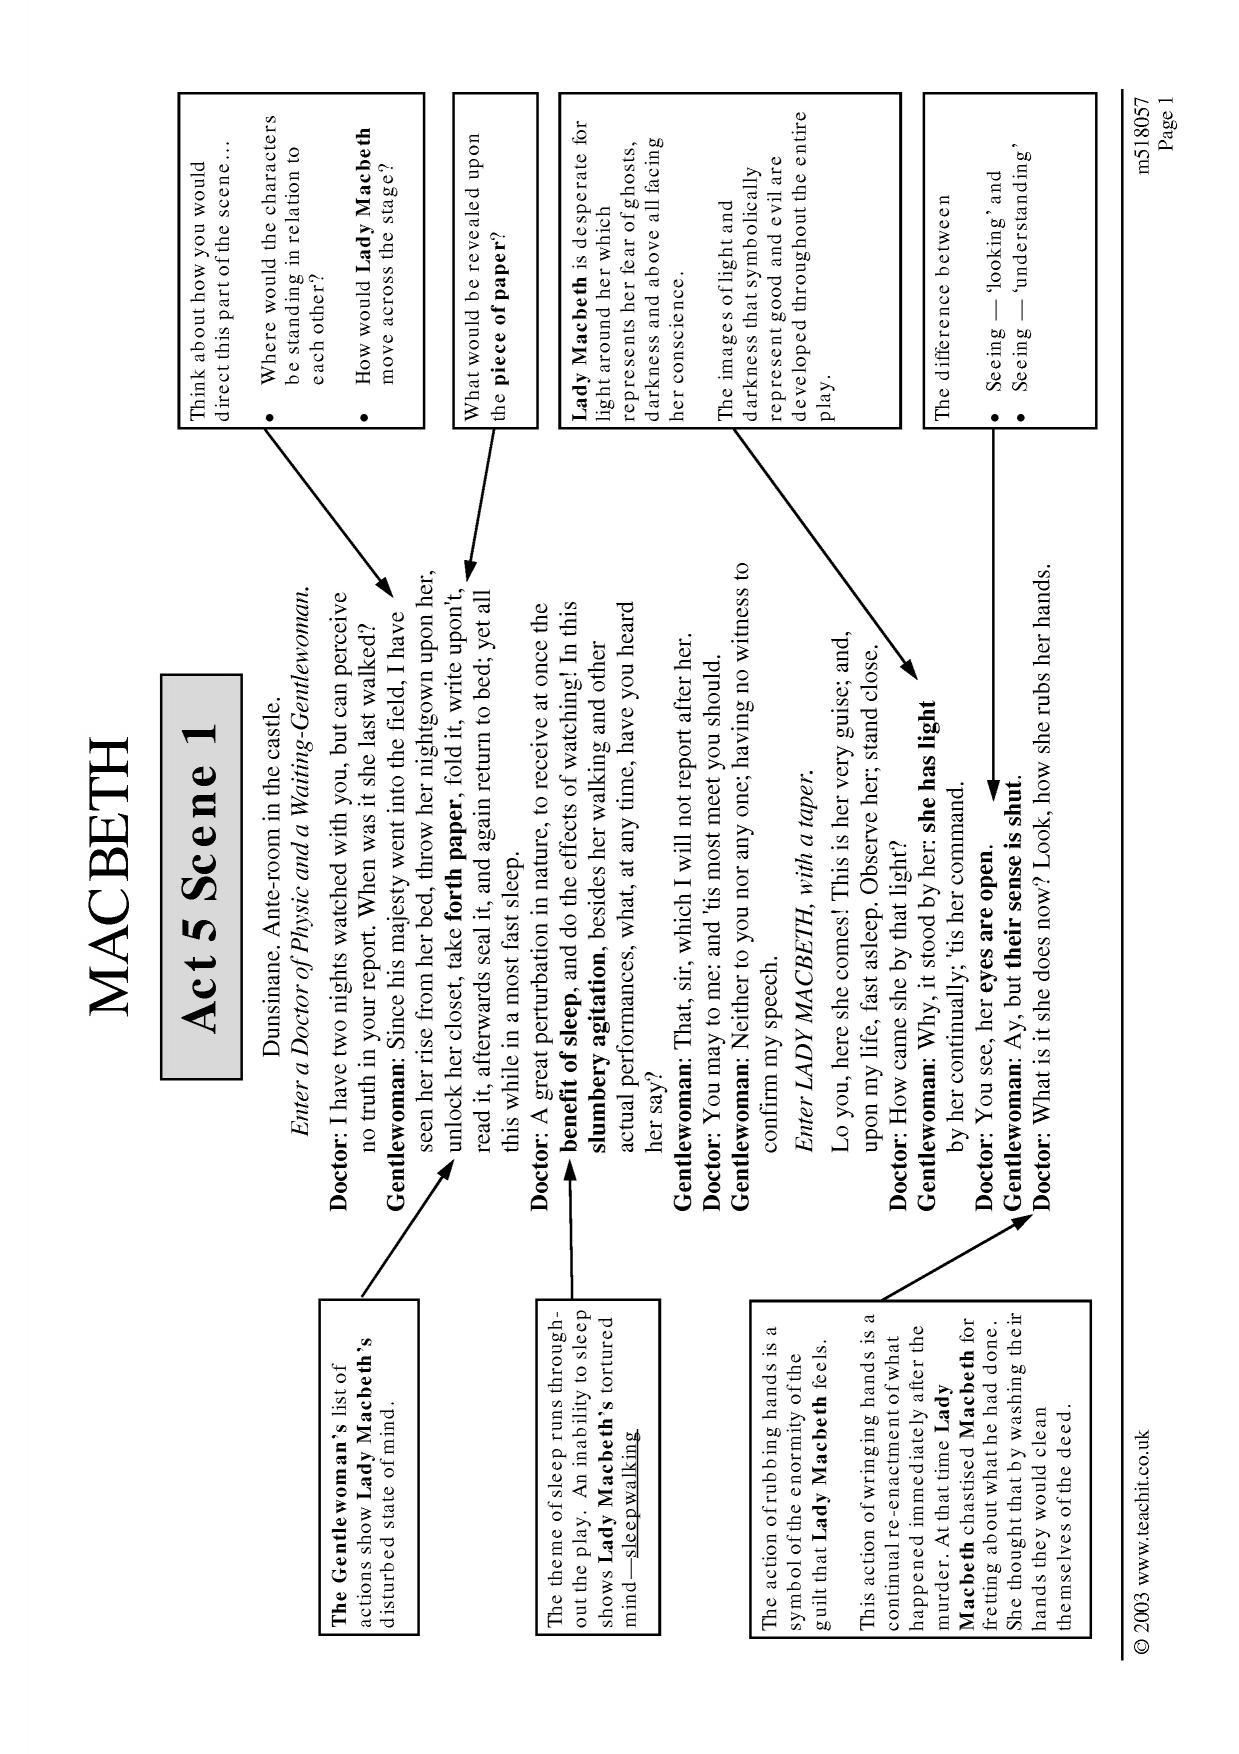 Ks3 macbeth act 5 teachit english 4 preview buycottarizona